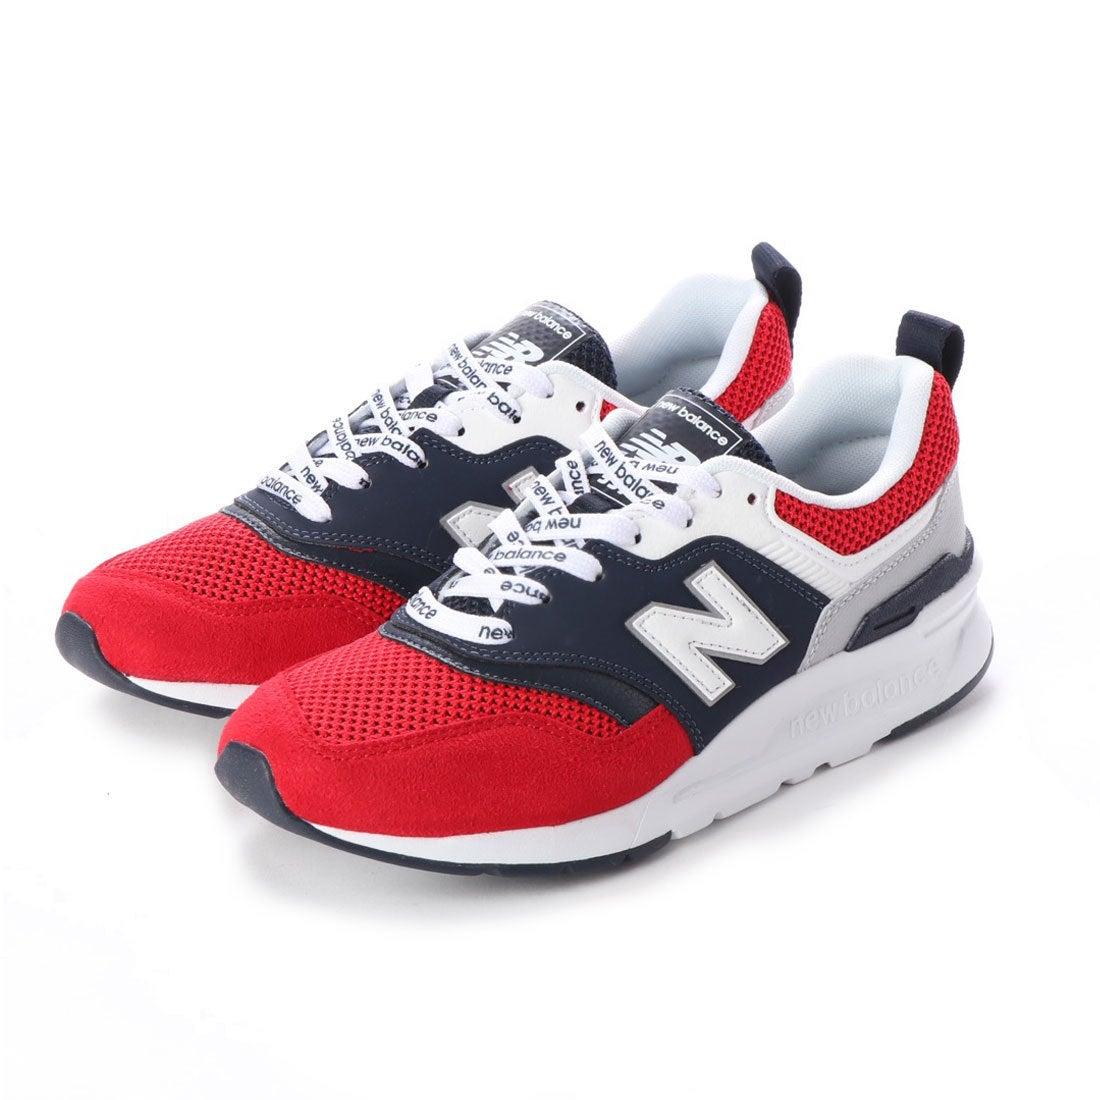 f7b0a626d5cd3 ニューバランス new balance NB CM997H ((EA)チームレッド) -靴&ファッション通販 ロコンド〜自宅で試着、気軽に返品